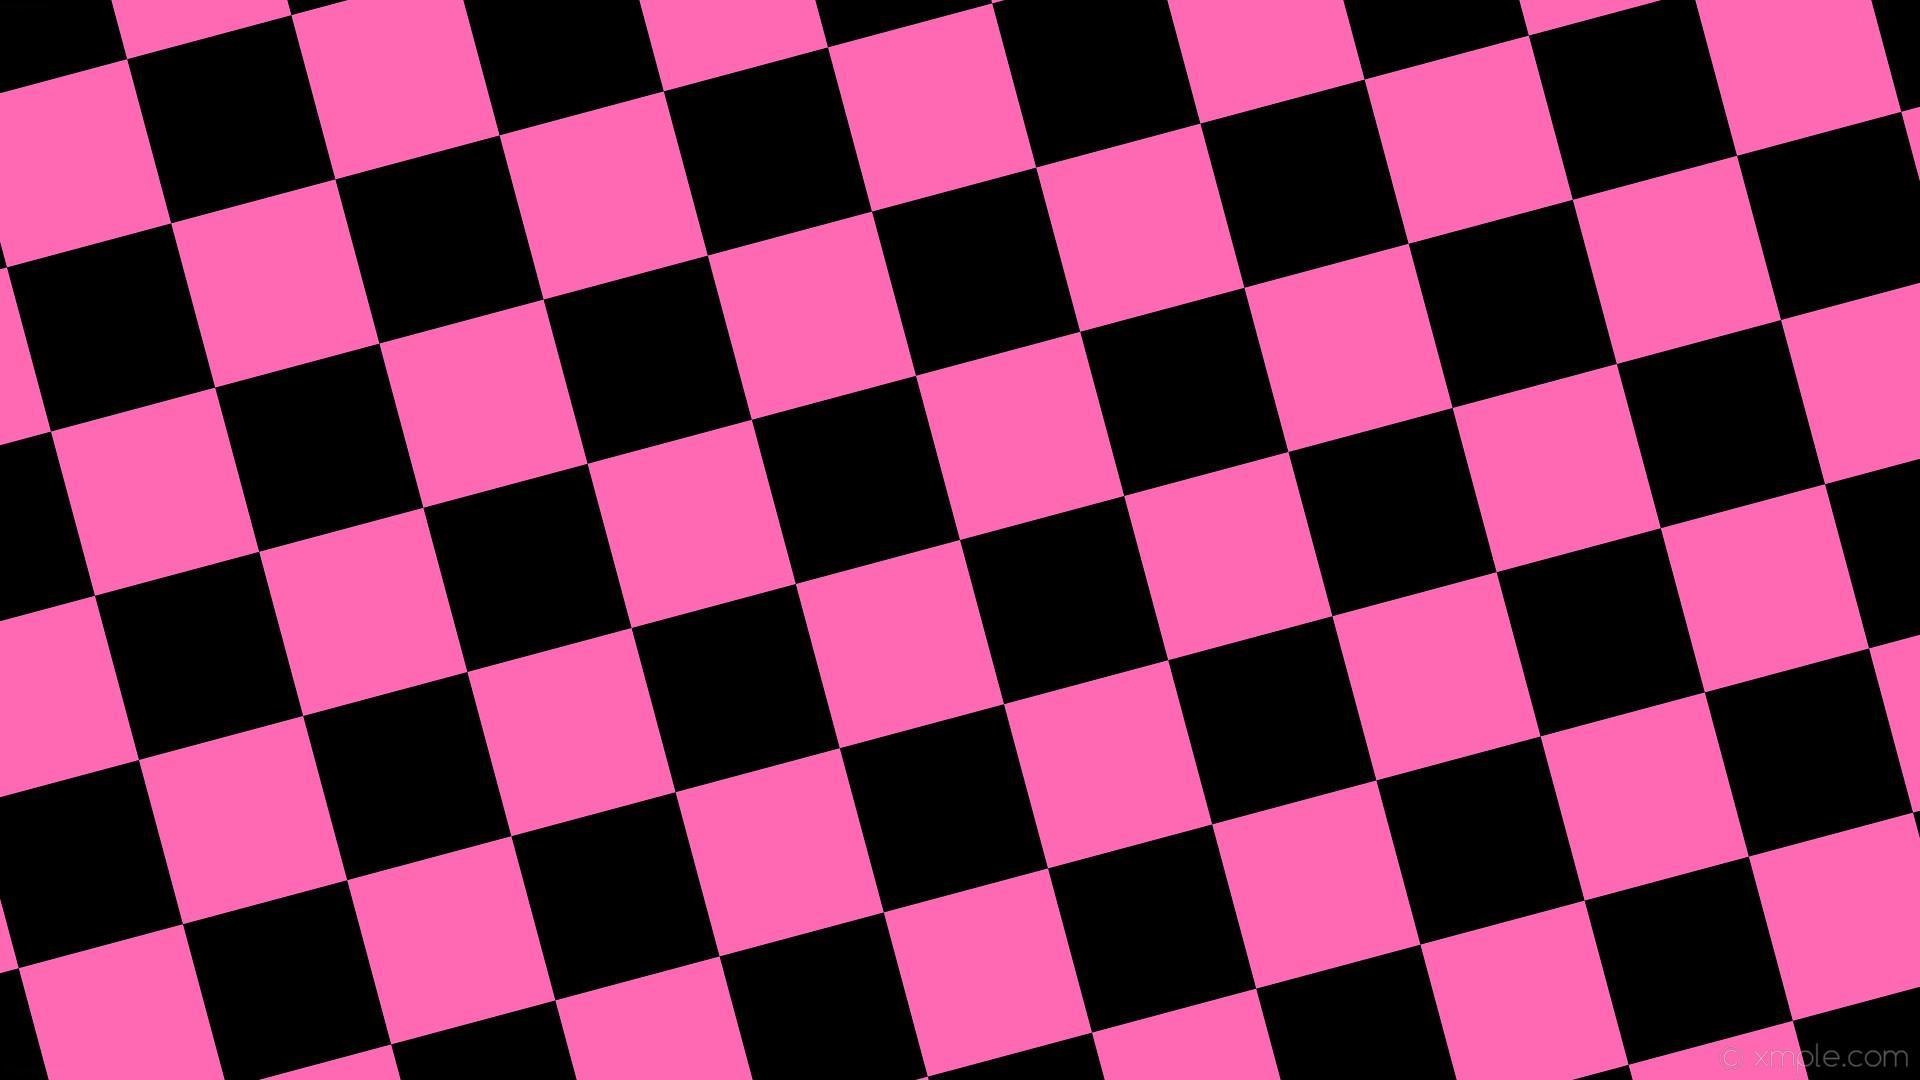 Pink Black Aesthetic Wallpapers Top Free Pink Black Aesthetic Backgrounds Wallpaperaccess Music aesthetic tumblr black aesthetic wallpaper laptop>. pink black aesthetic wallpapers top